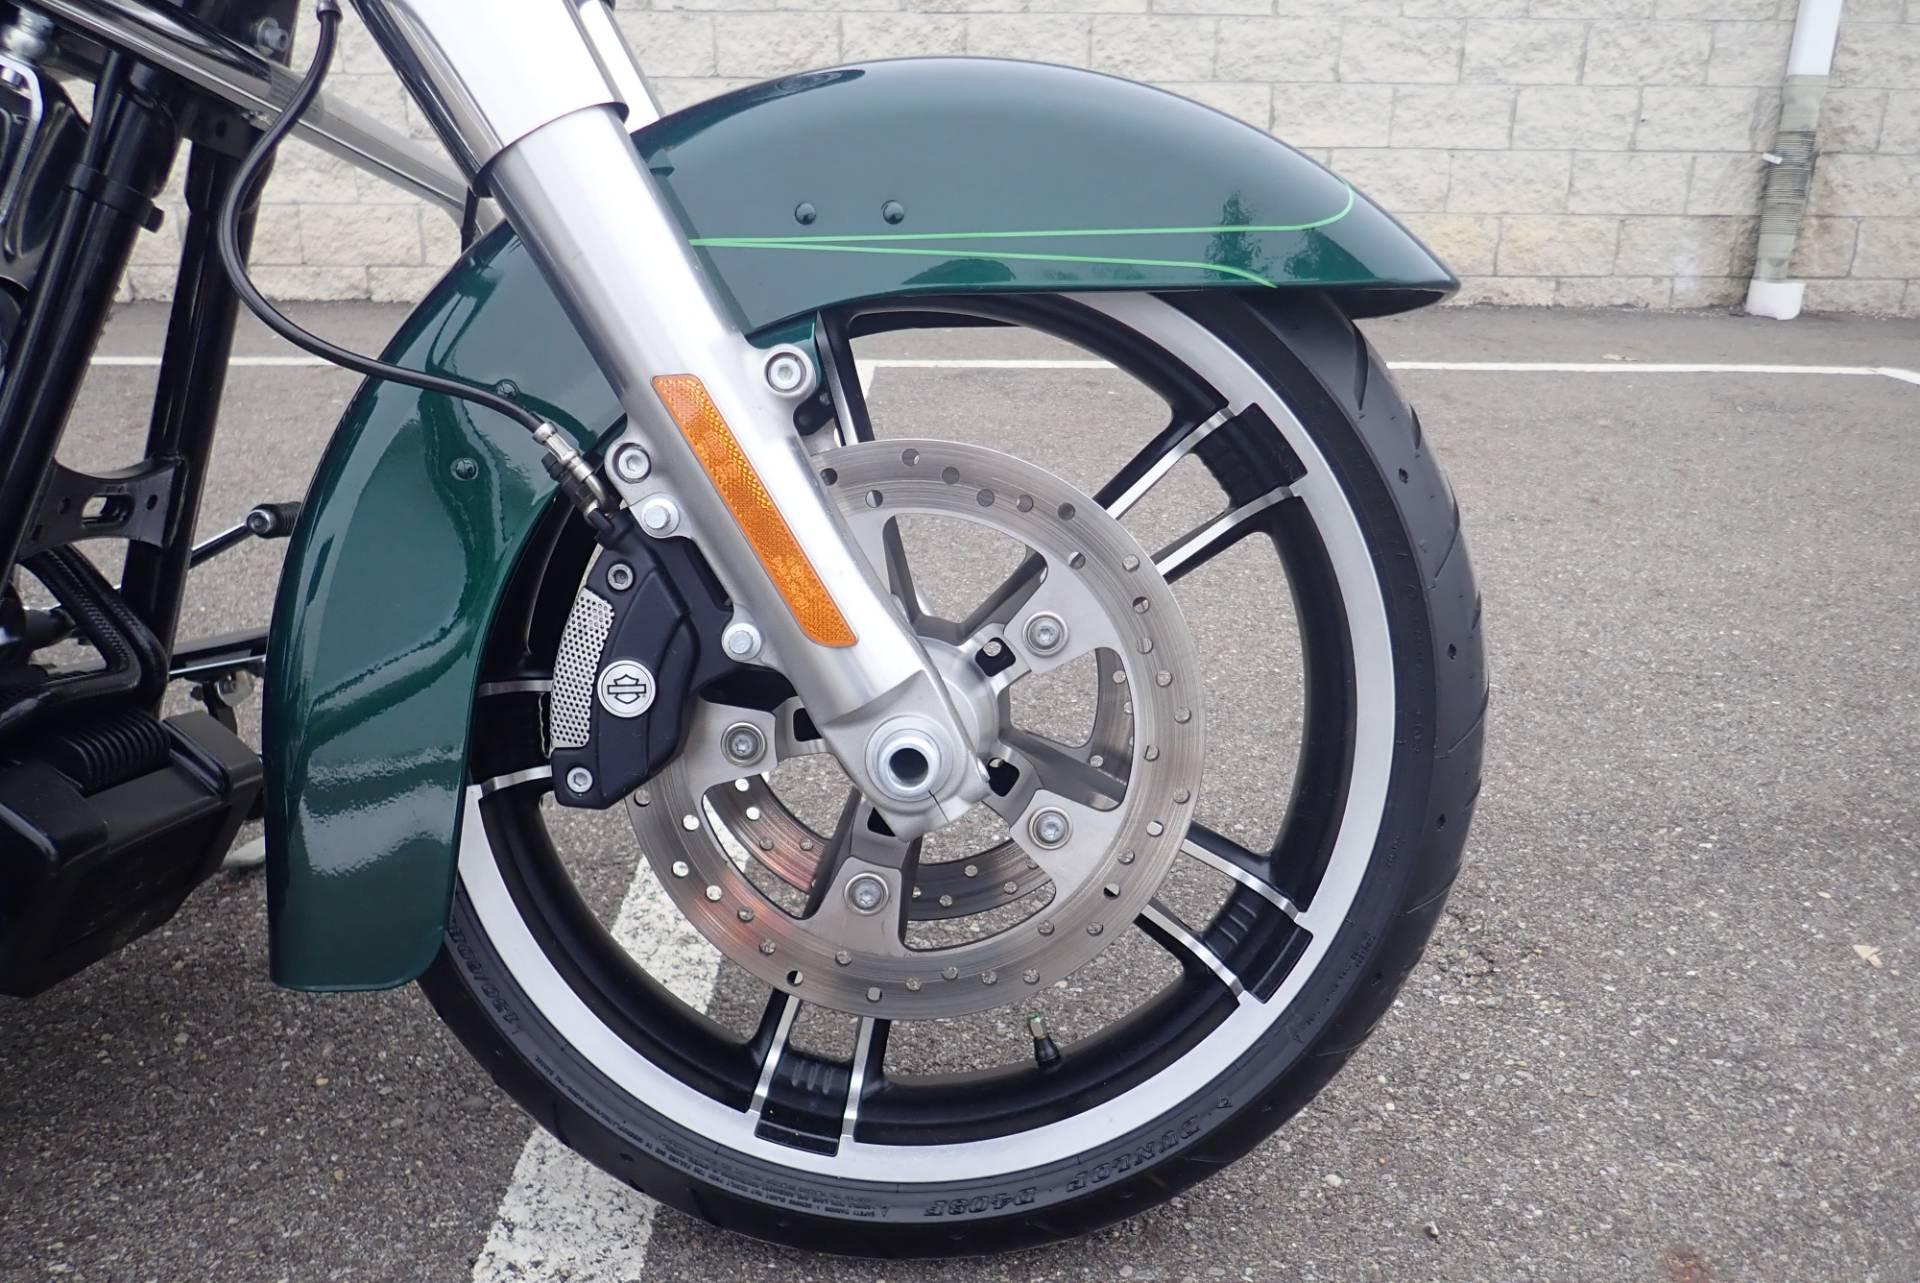 2015 Harley-Davidson Street Glide Special 2